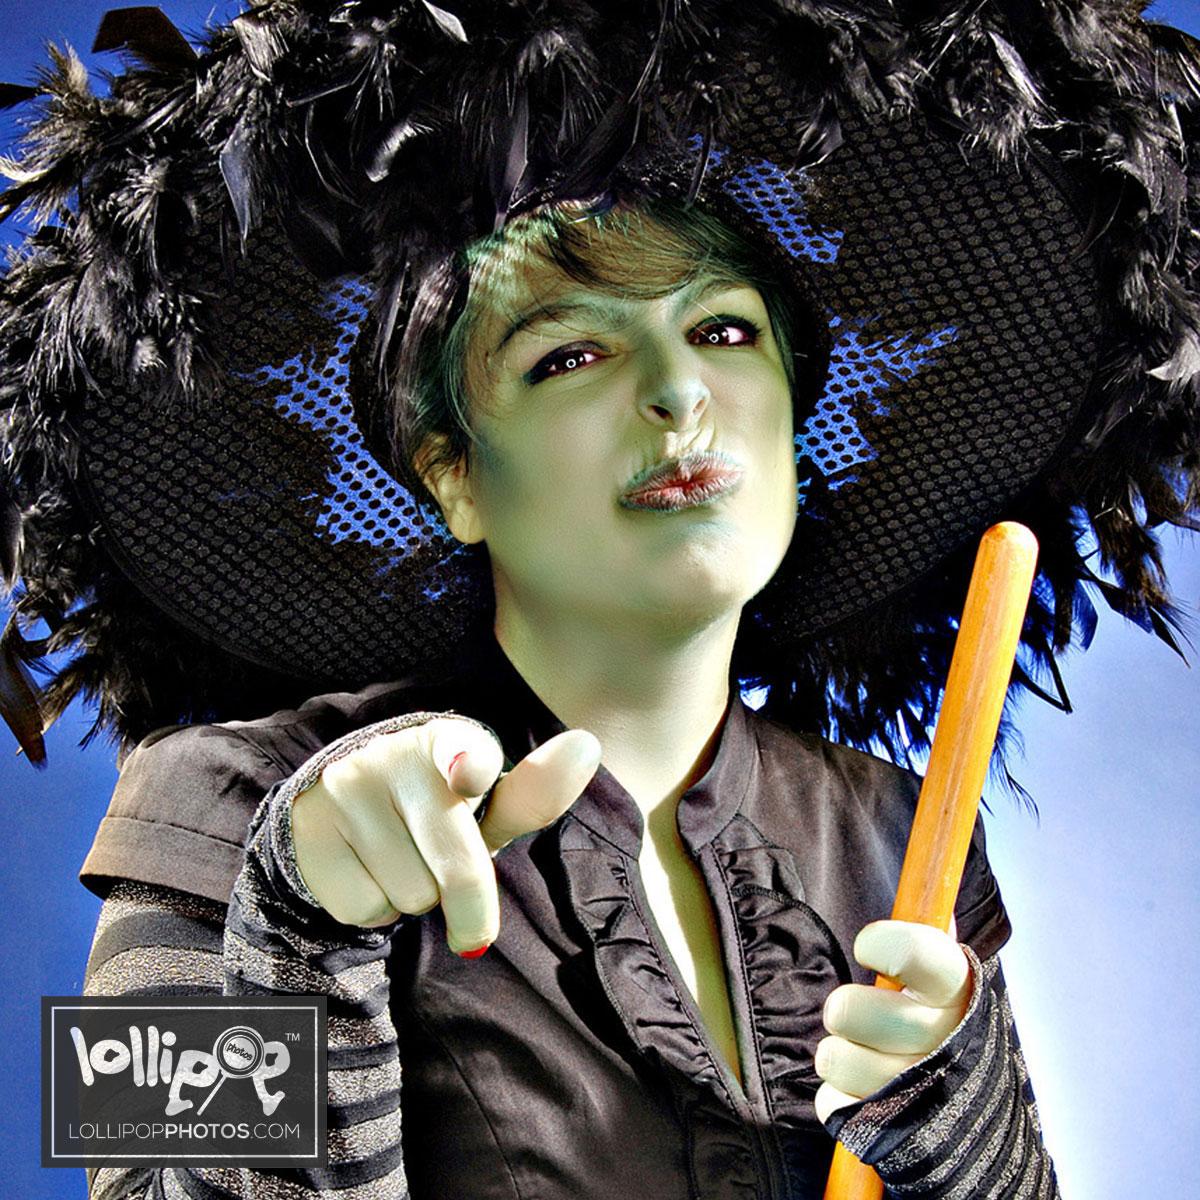 msdig-nora-canfield-lollipop-photos-441.jpg